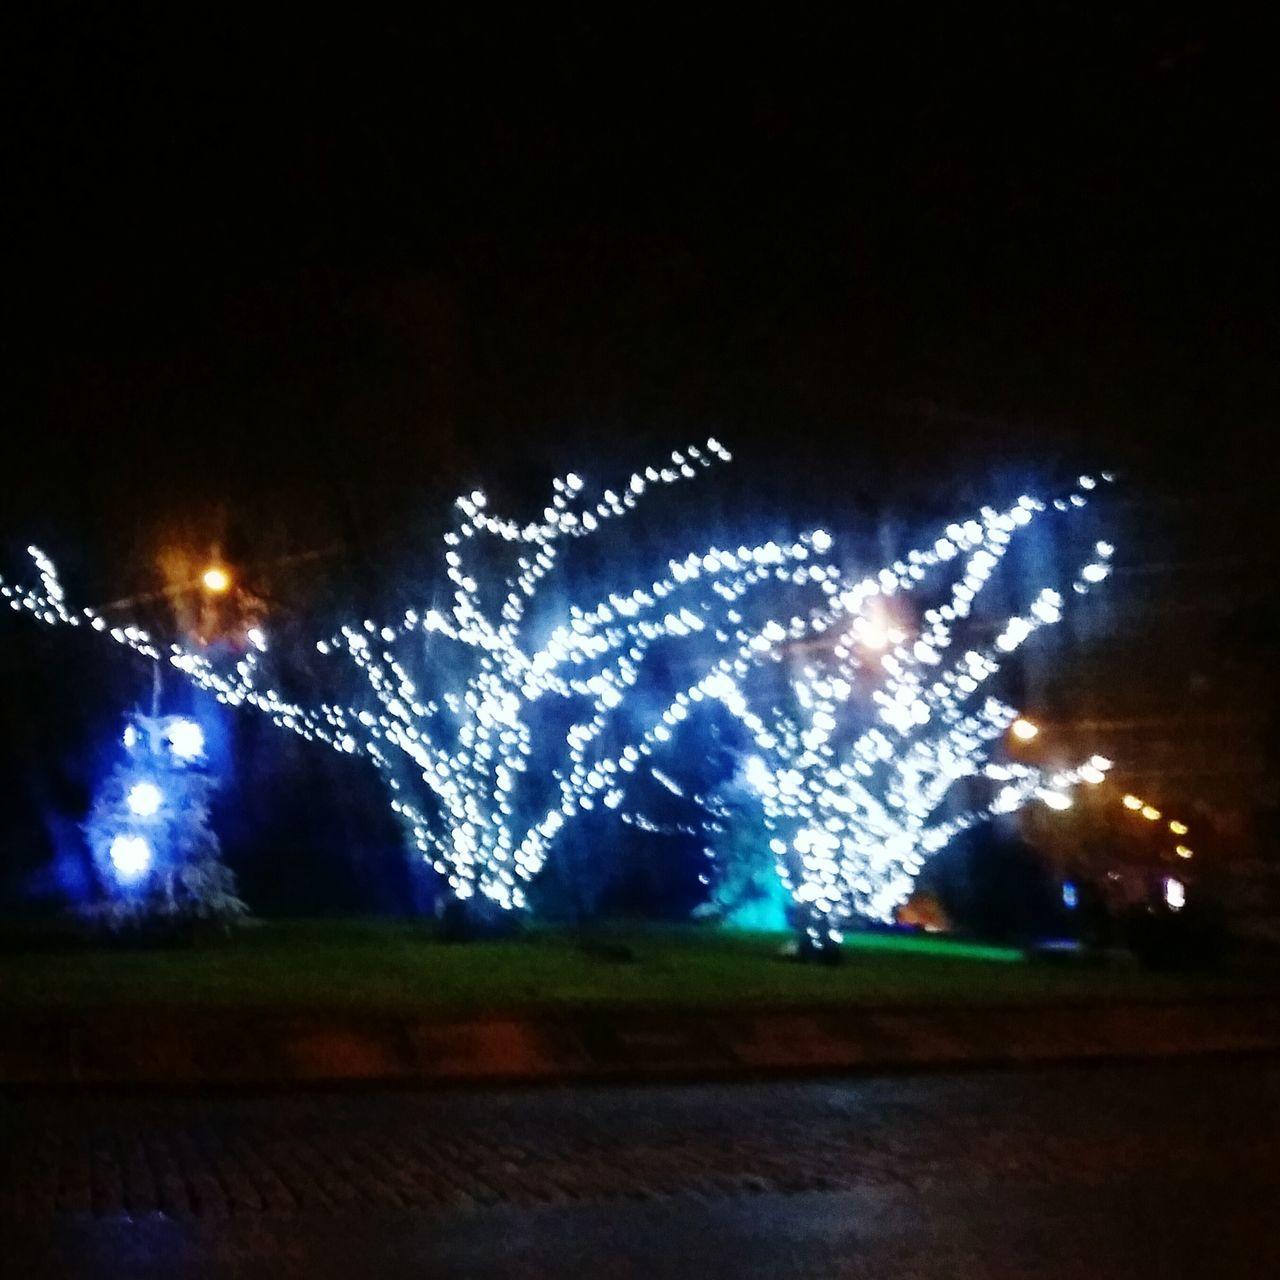 Illuminated Night Celebration Christmas Decoration Outdoors No People Exterieurs Christmas Christmas Tree Arbres Tree Treeoflight Noël Weinachten Weinachtslicht